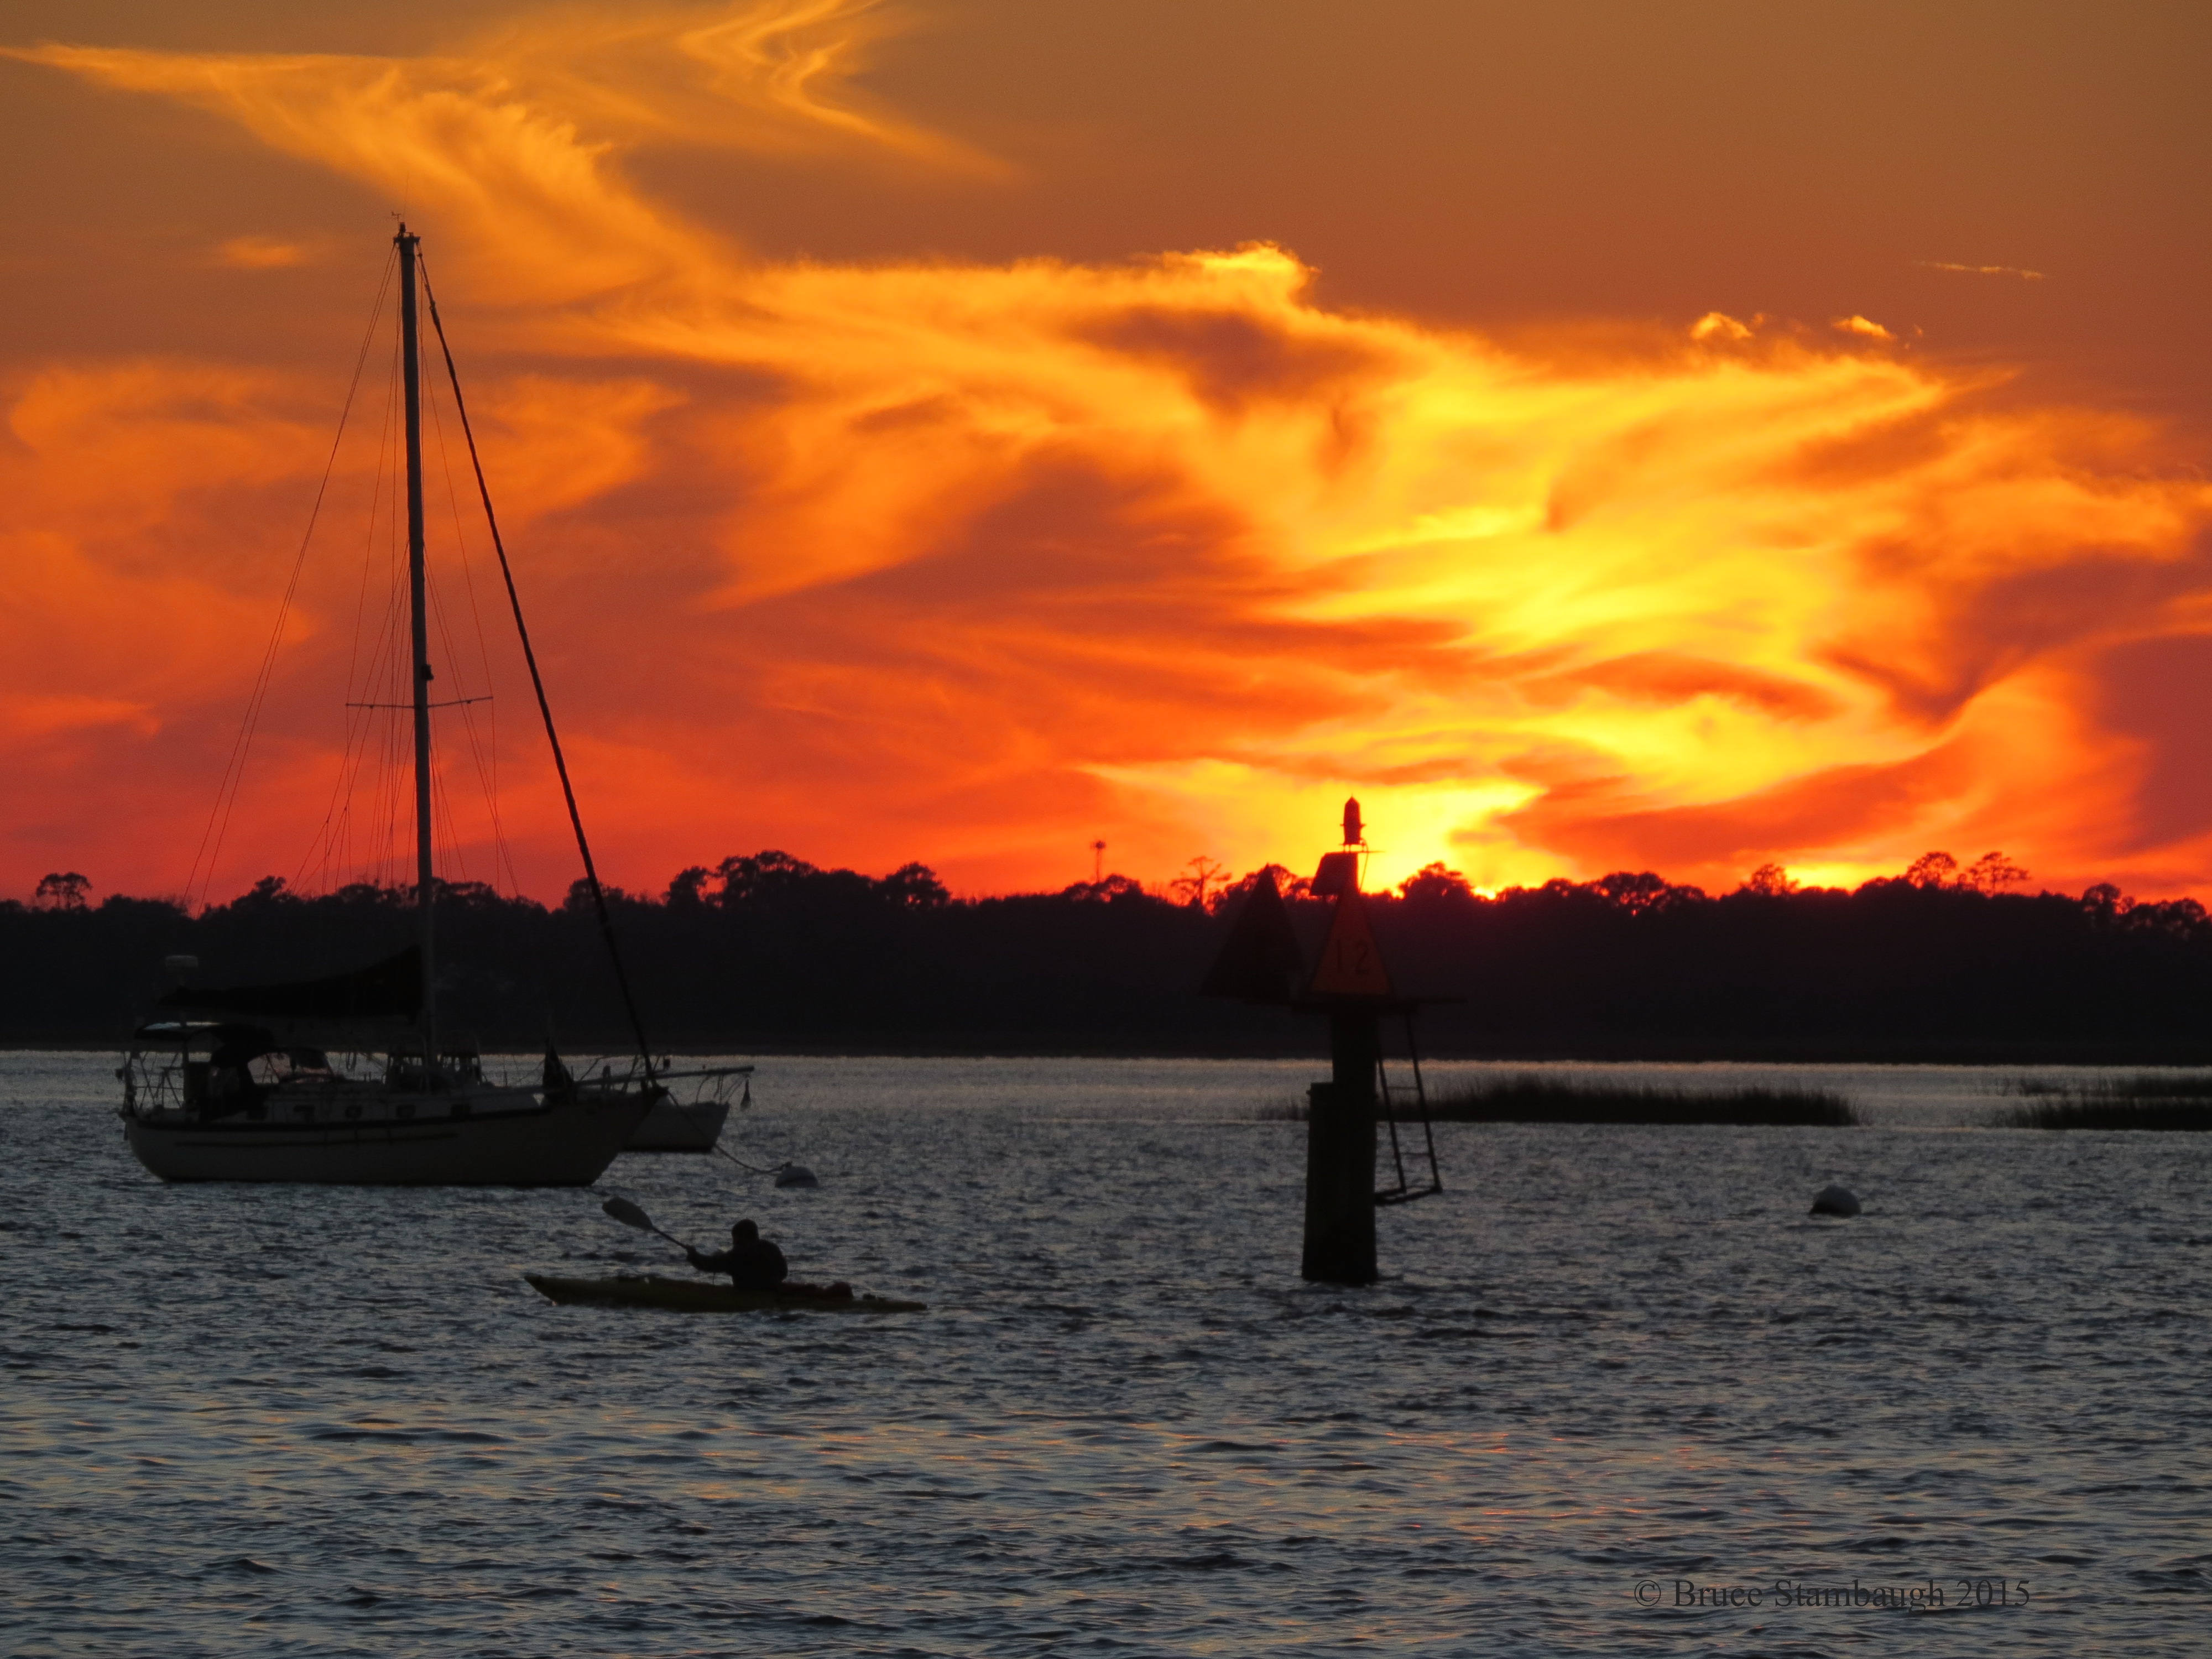 kayak, sunset, Bruce Stambaugh